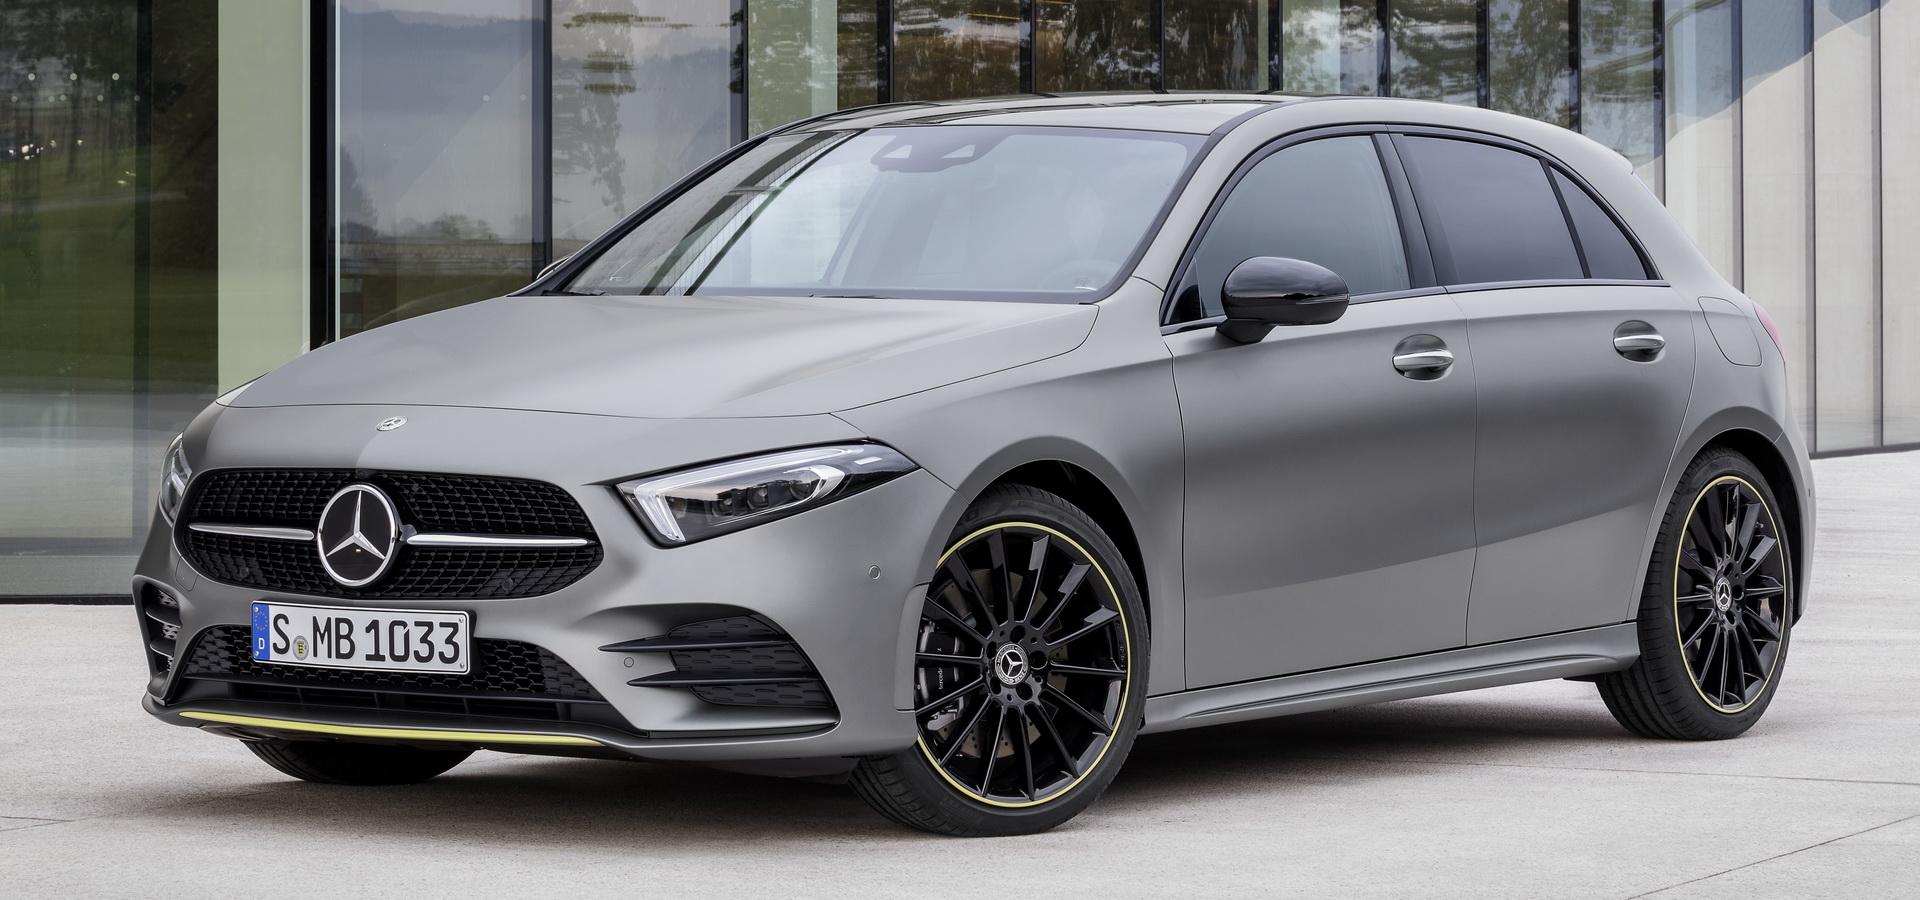 2020 Bmw 1 Series Vs Mercedes A Class Which Premium Hatch